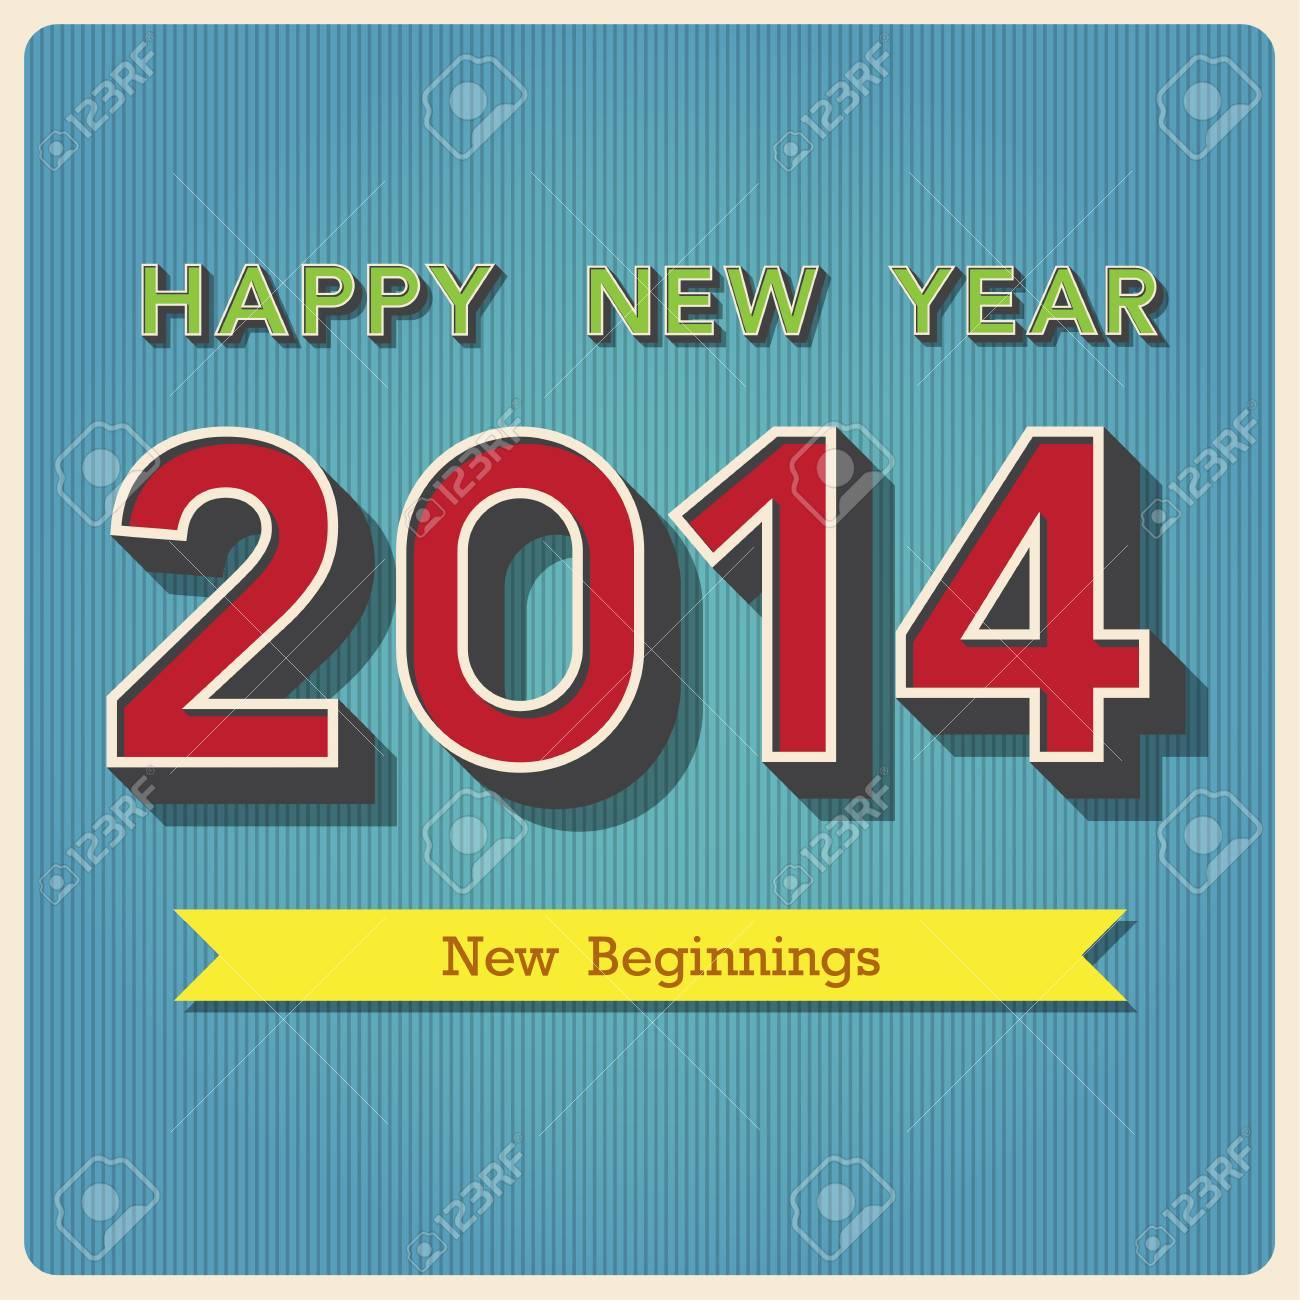 Happy new year retro poster. Stock Vector - 24440355